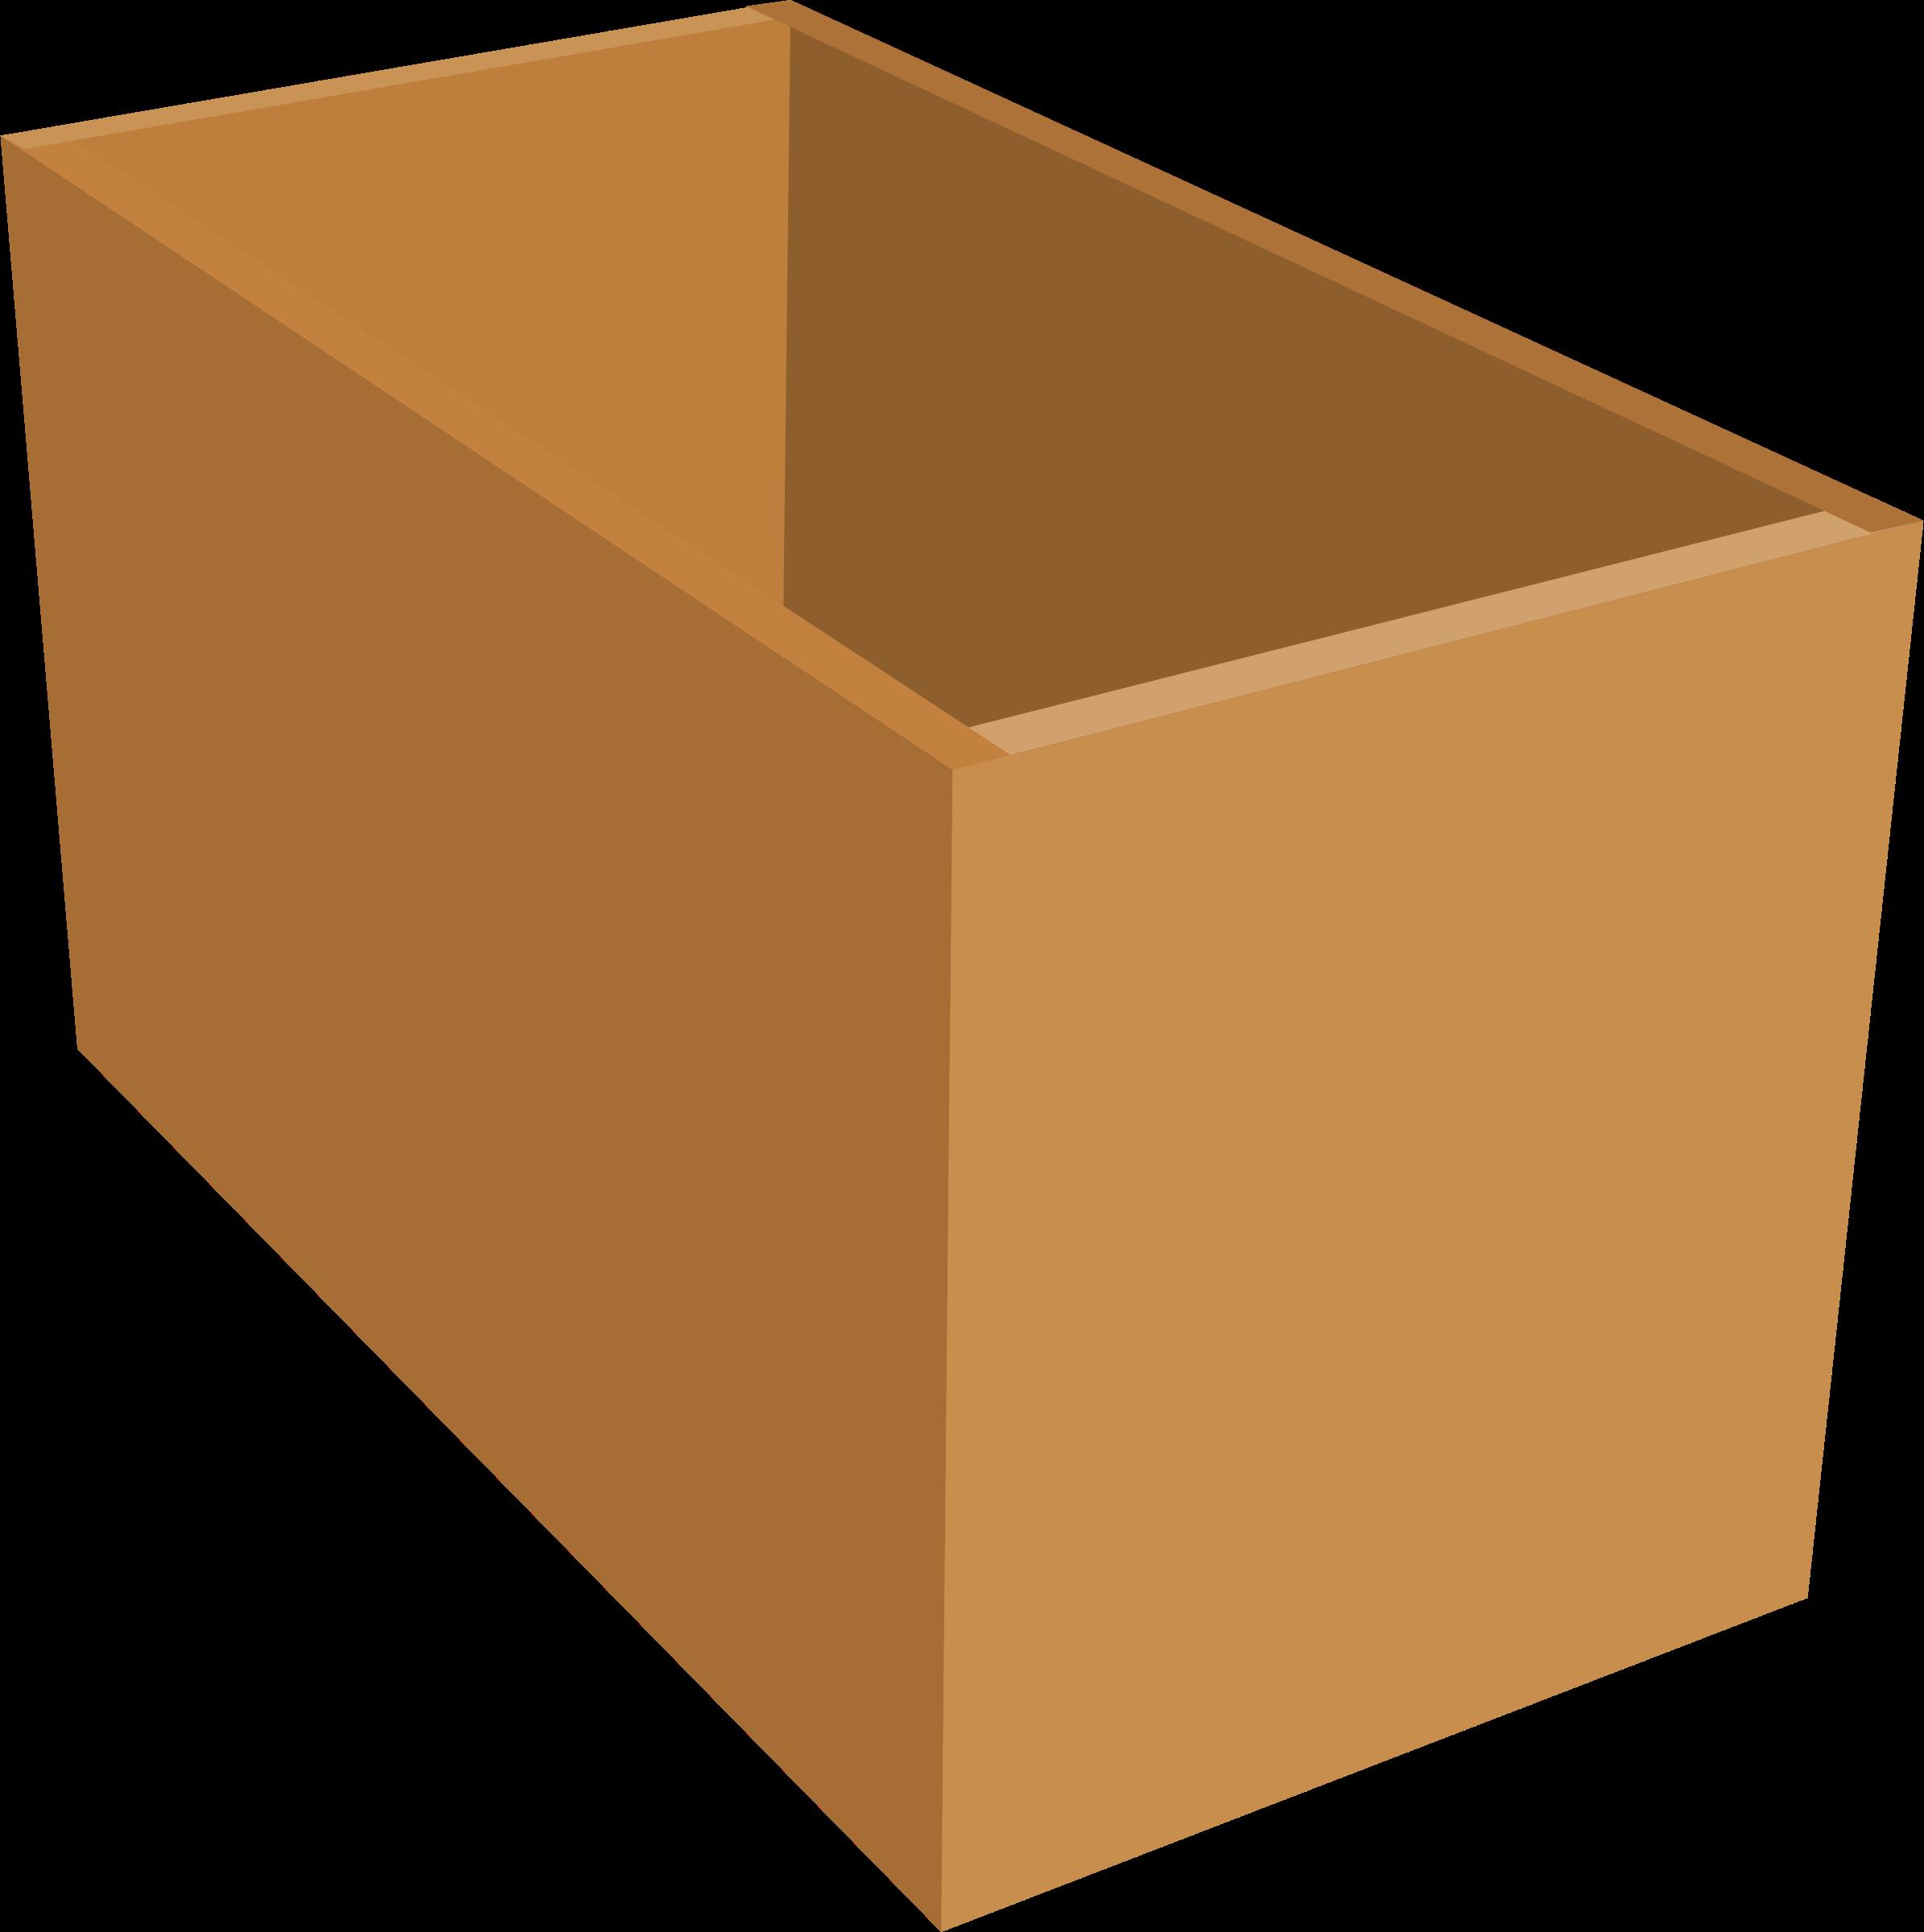 vector transparent stock Thick walls big image. Box clipart wood box.